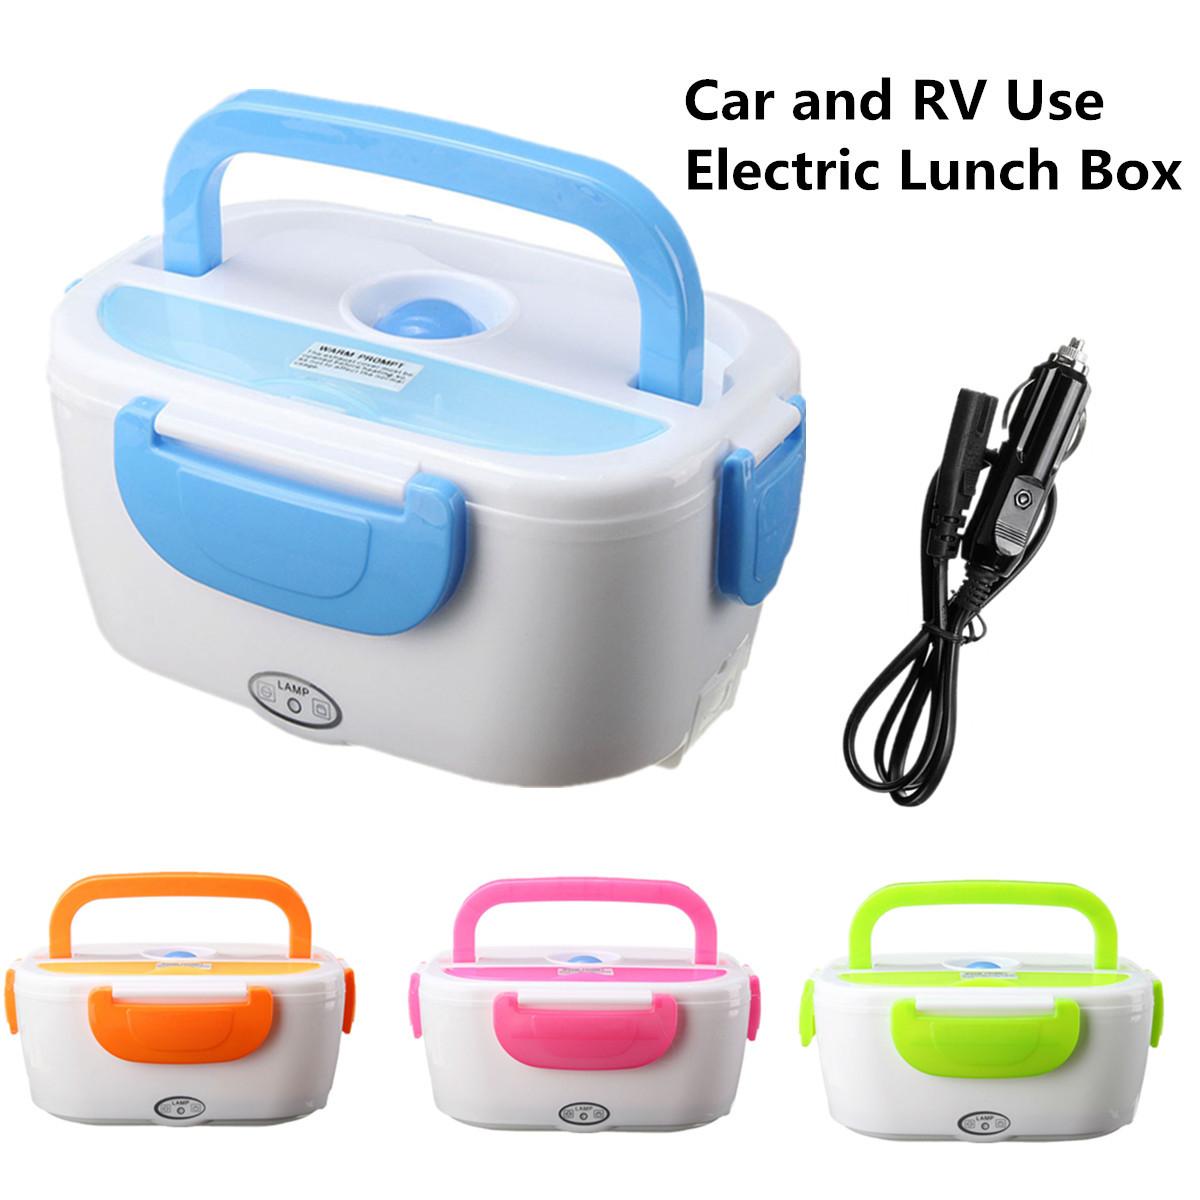 Ланч-бокс с подогревом для автомобиля 12V The Electric Lunch Box